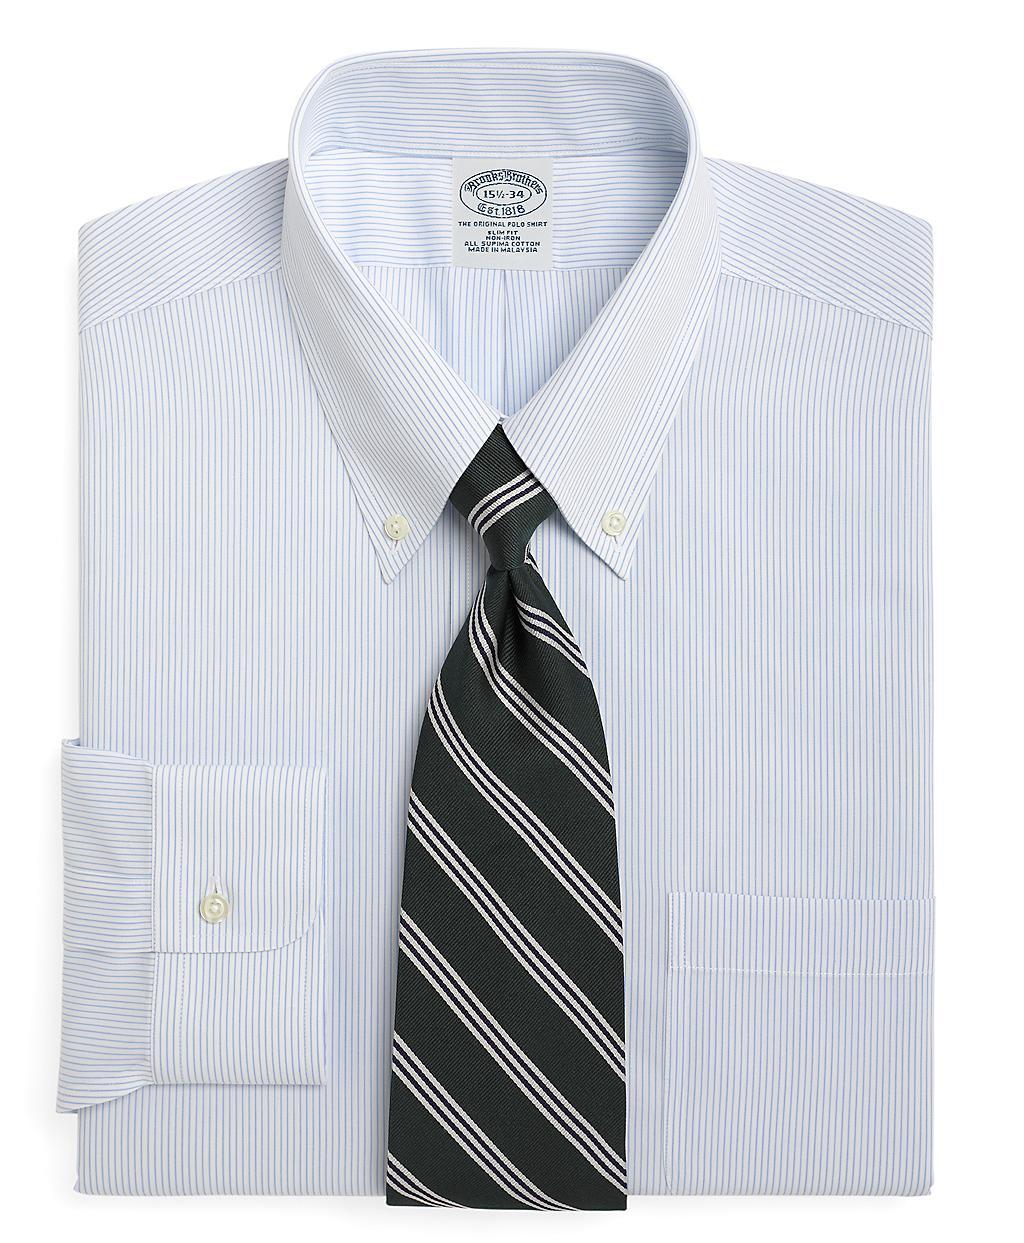 Brooks brothers non iron regent fit mini pinstripe dress for Brooks brothers non iron shirts review